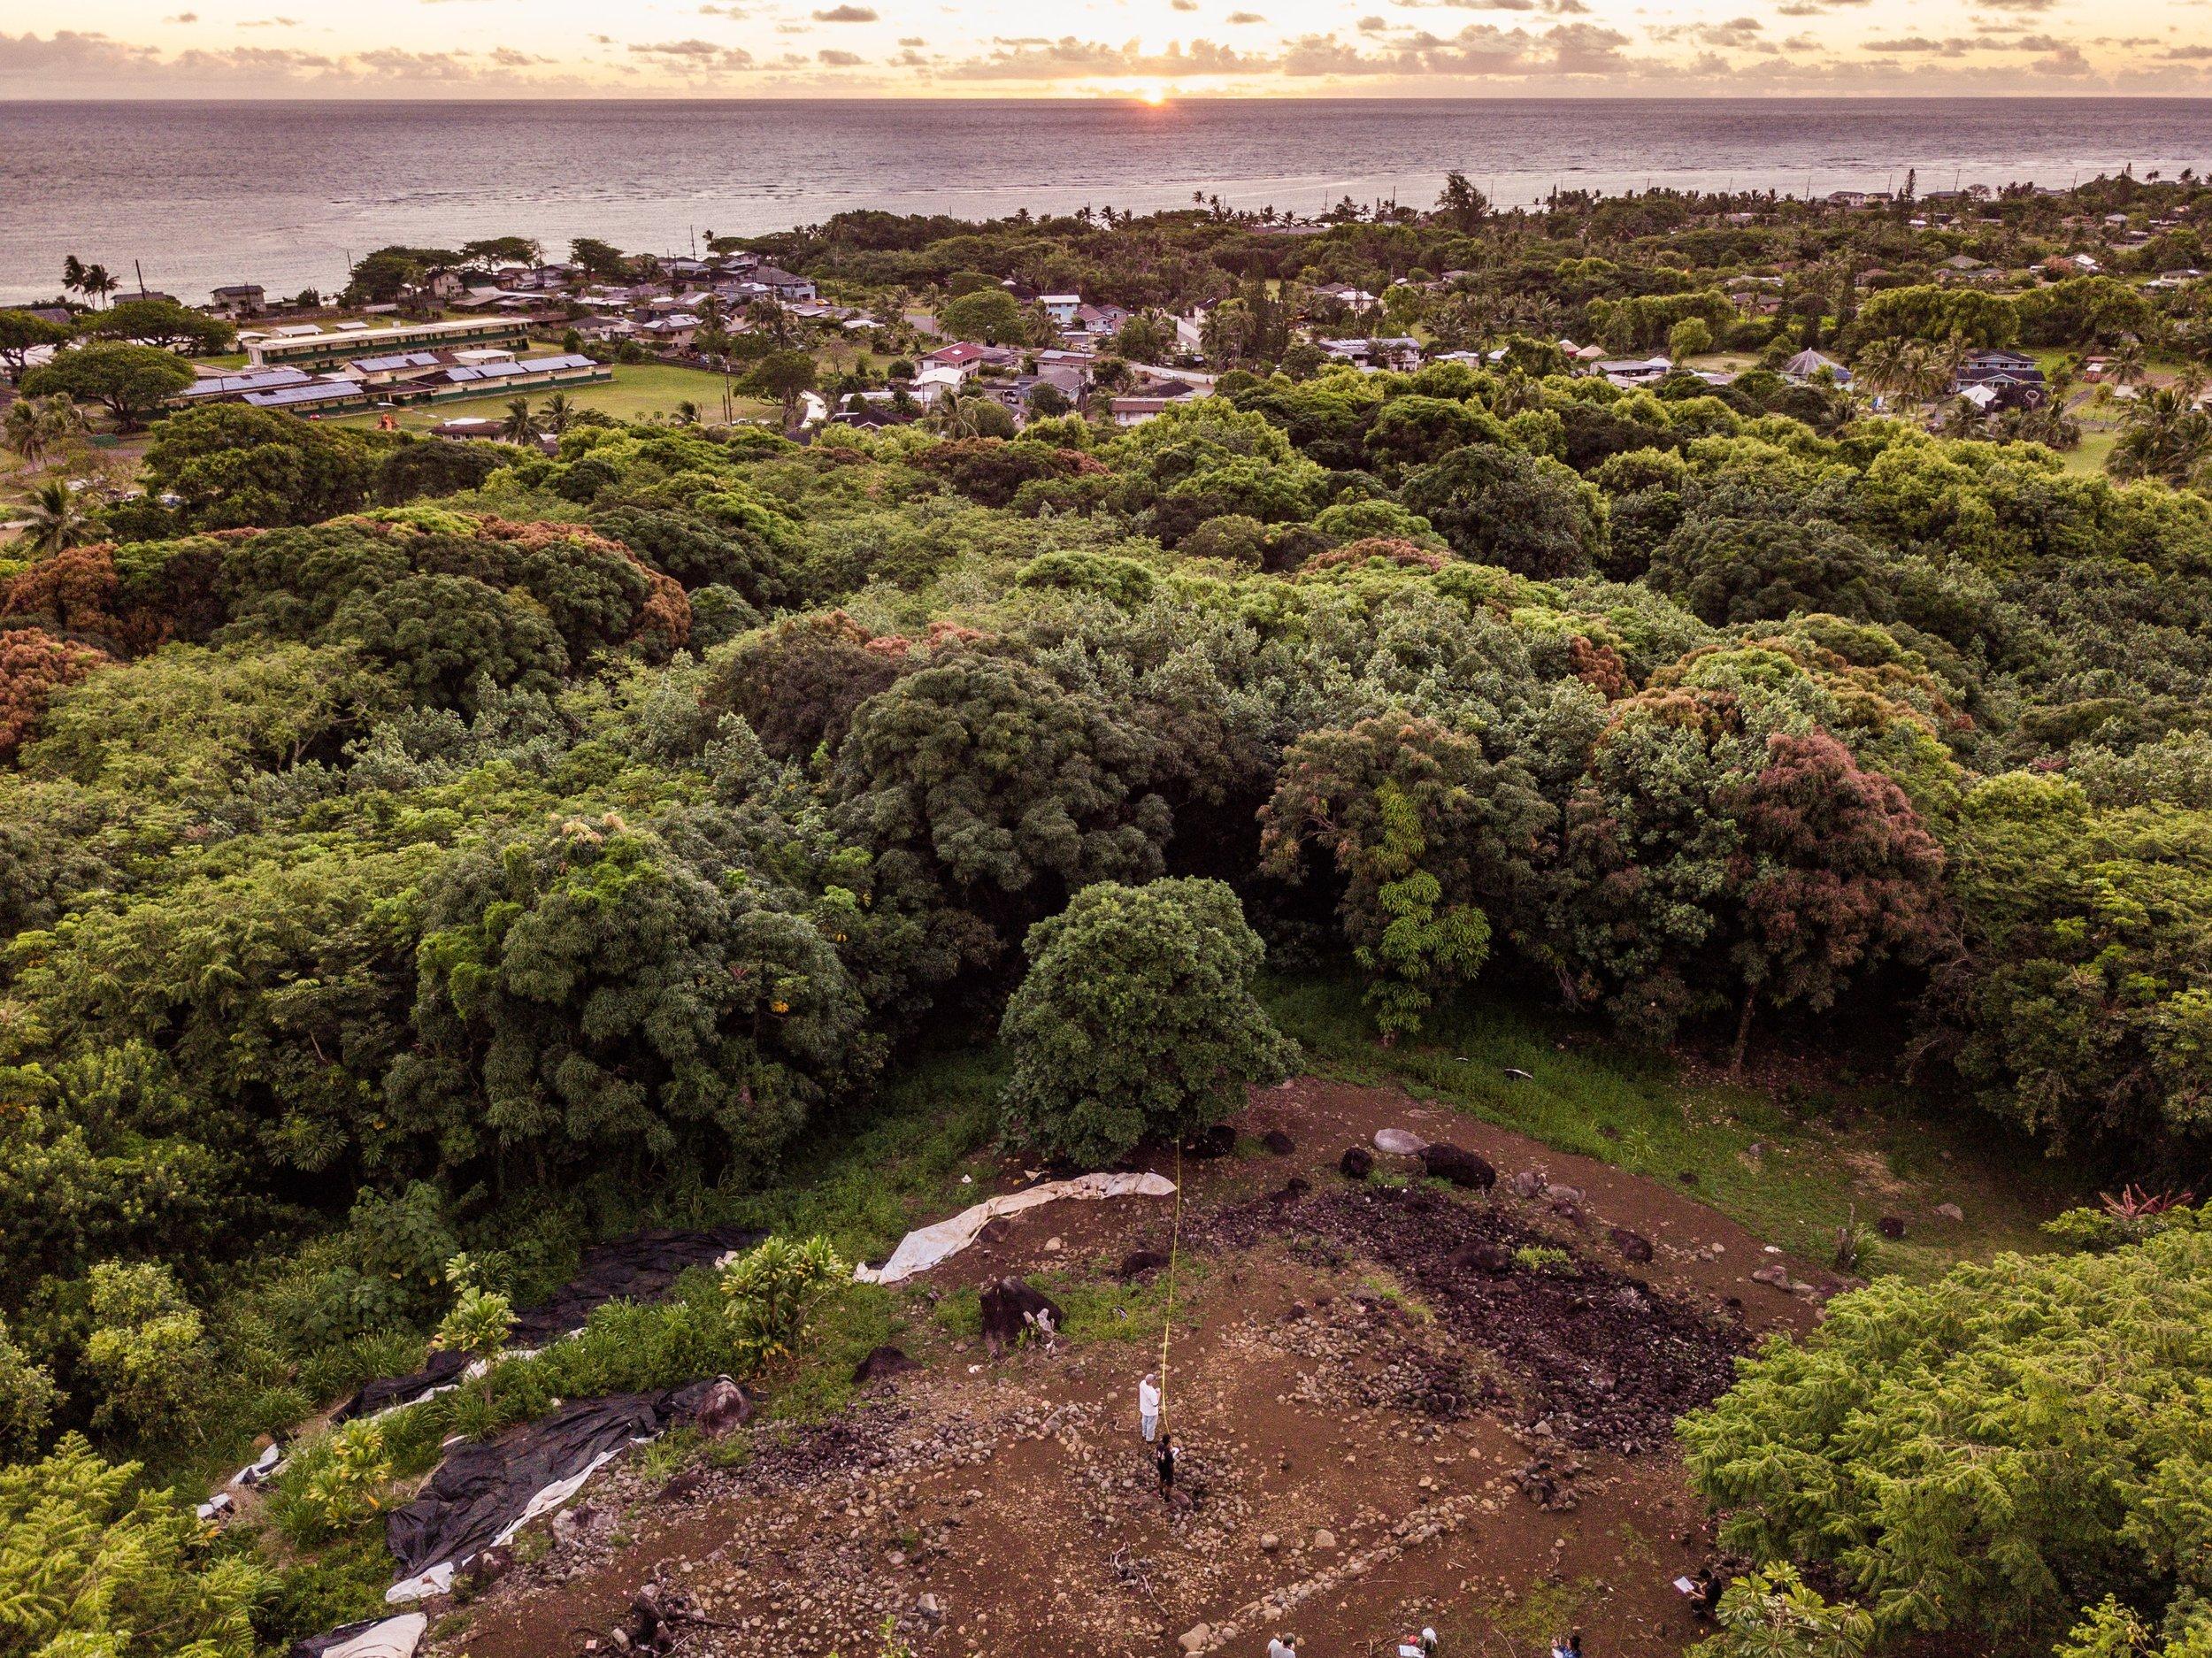 Maunawila - Make an annual gift of $3,000 or more.